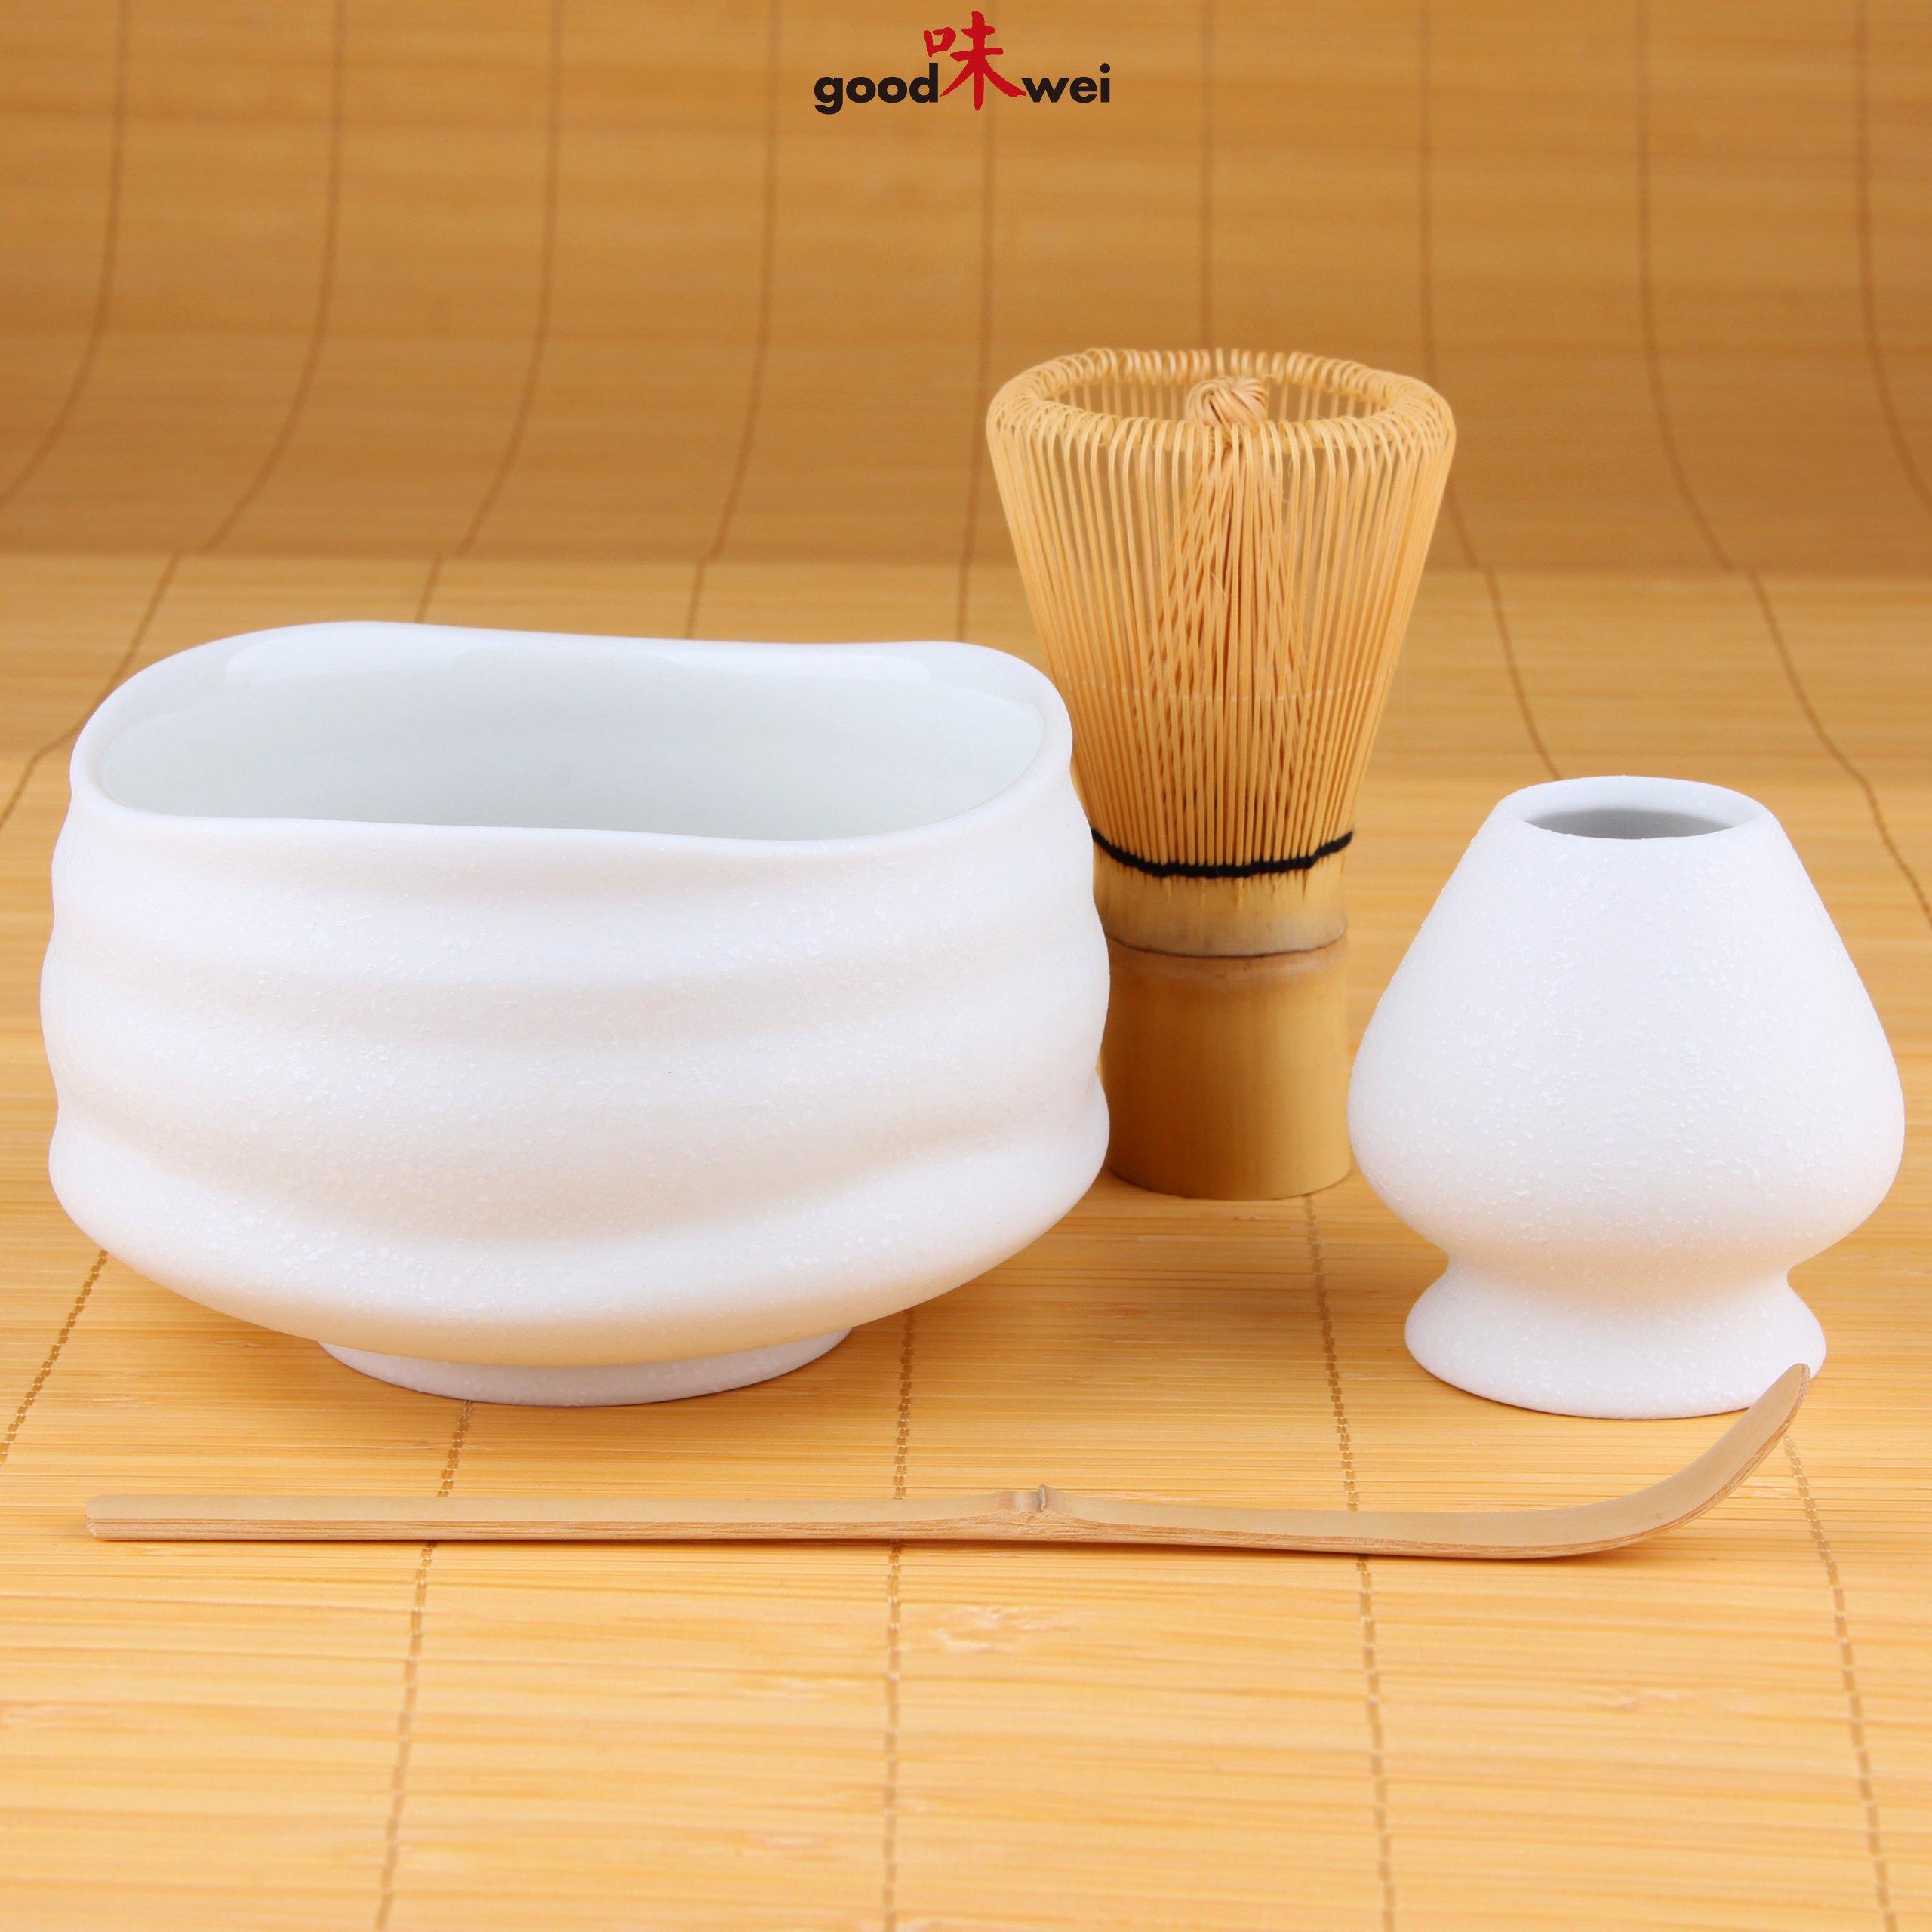 Goodwei Premium Matcha Tea Set ''Miyuki'' - Ceremonial Bowl Chawan, Whisk and Holder - Gift Box (80)